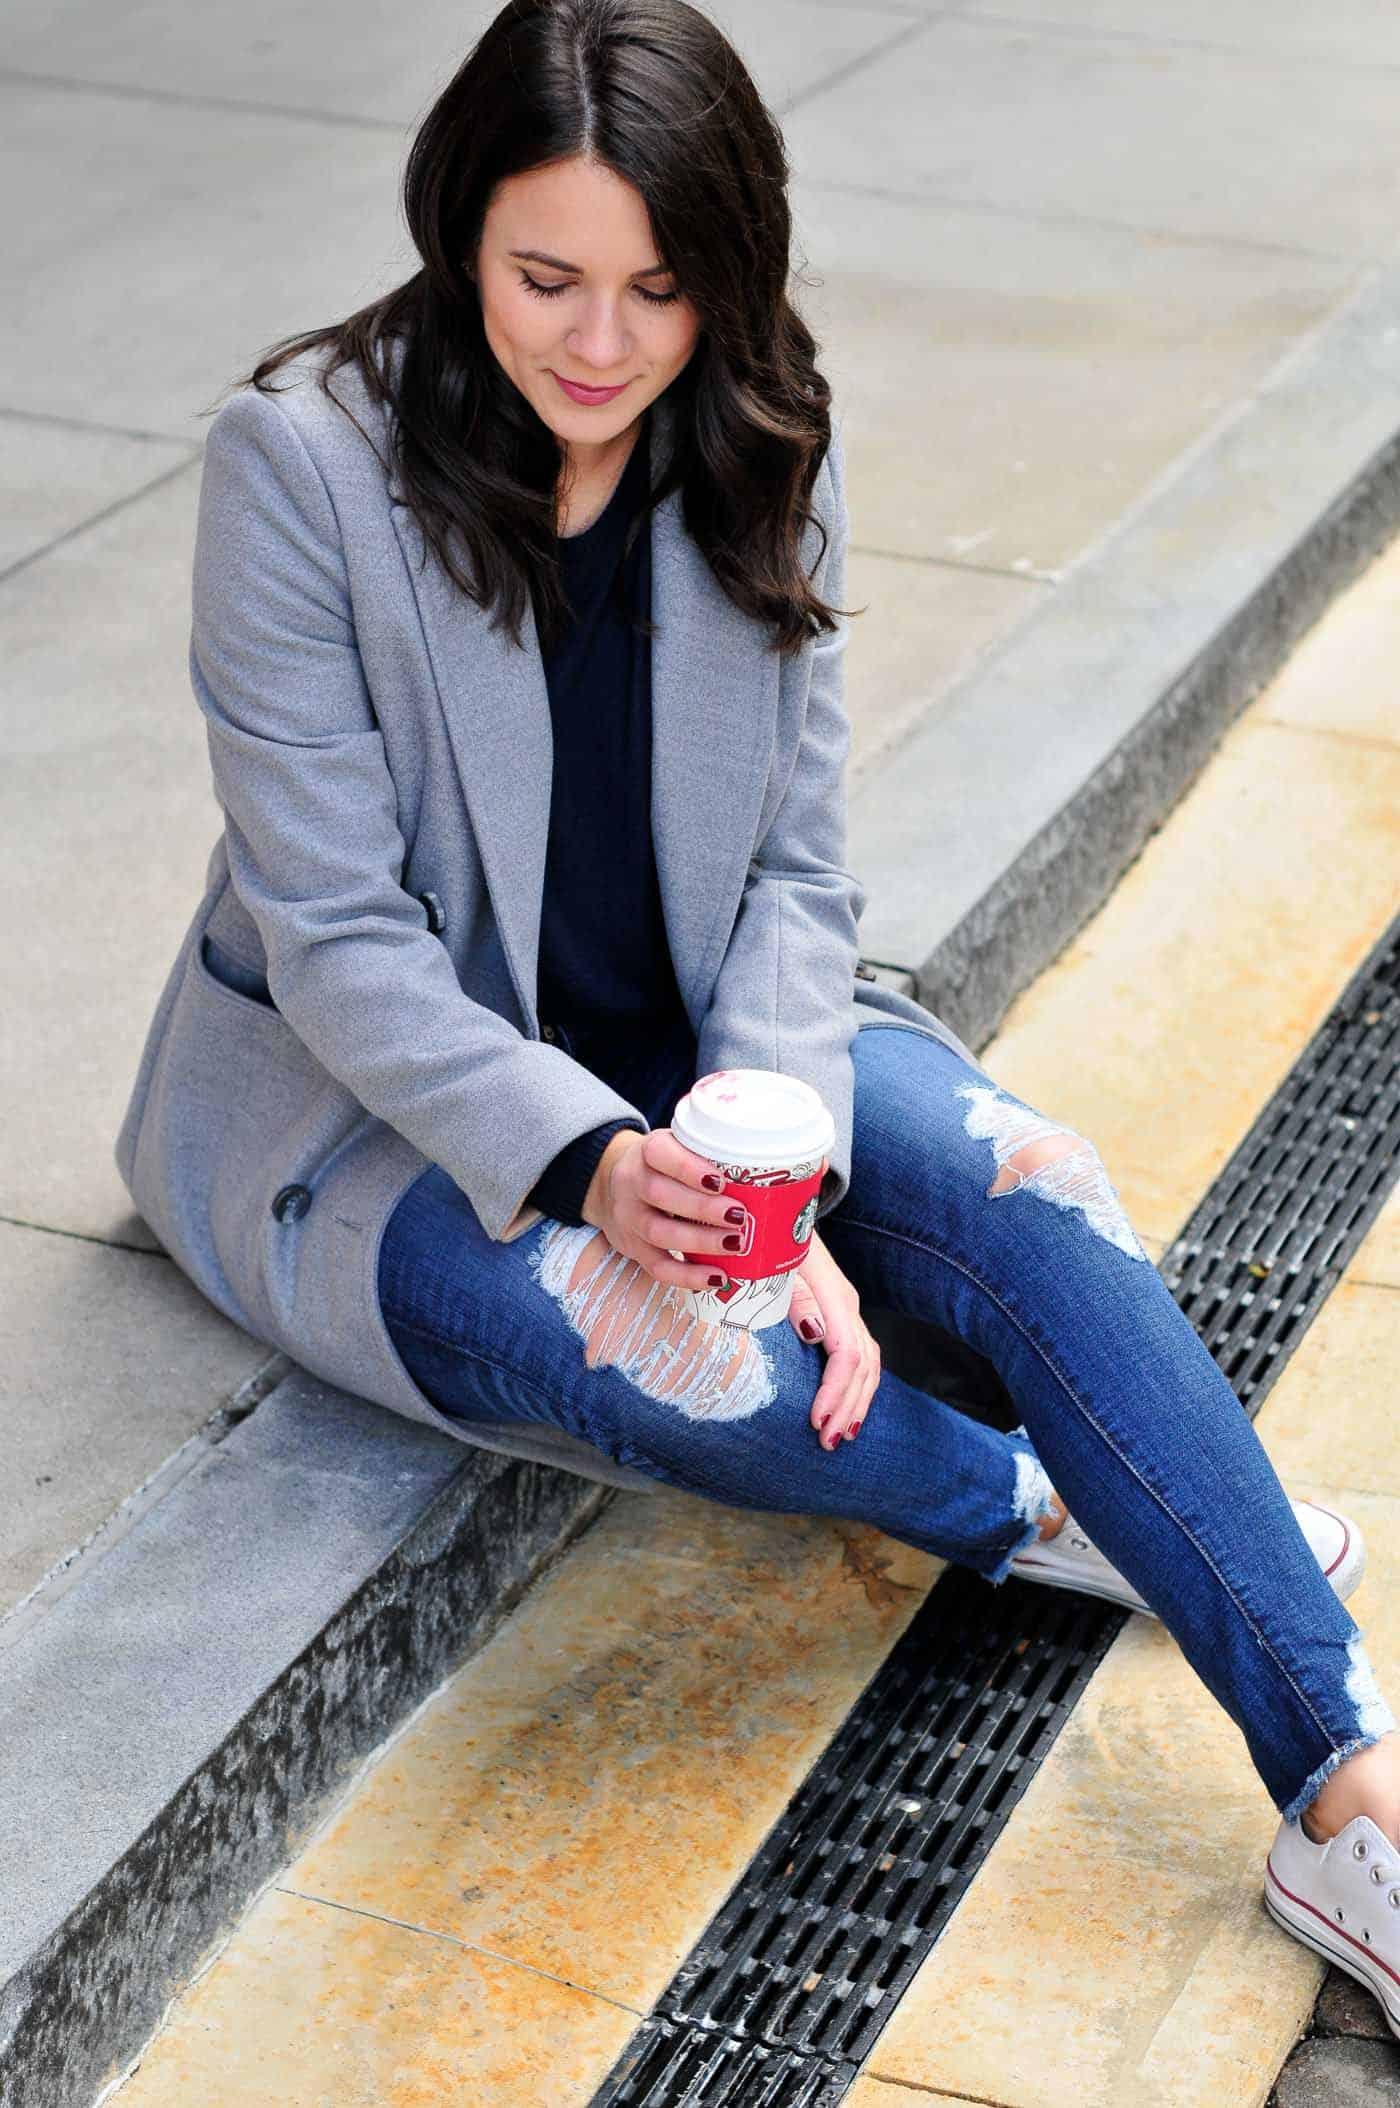 grey coat and converse, how to dress down a grey coat - My Style Vita @mystylevita